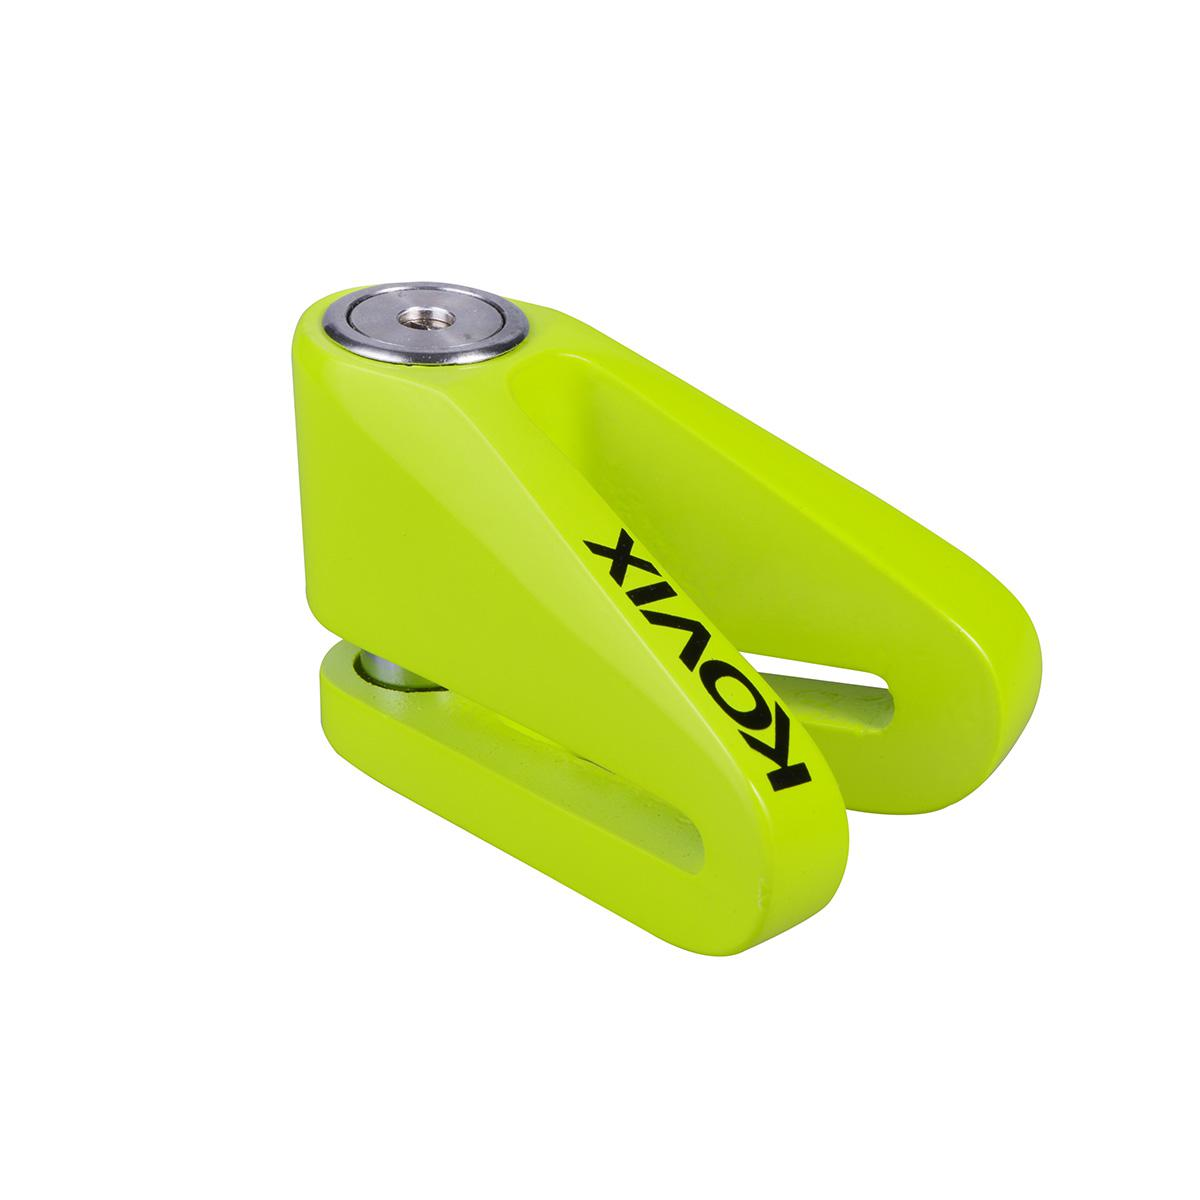 KVX-FG (acero inoxidable) verde fluor 14 mm